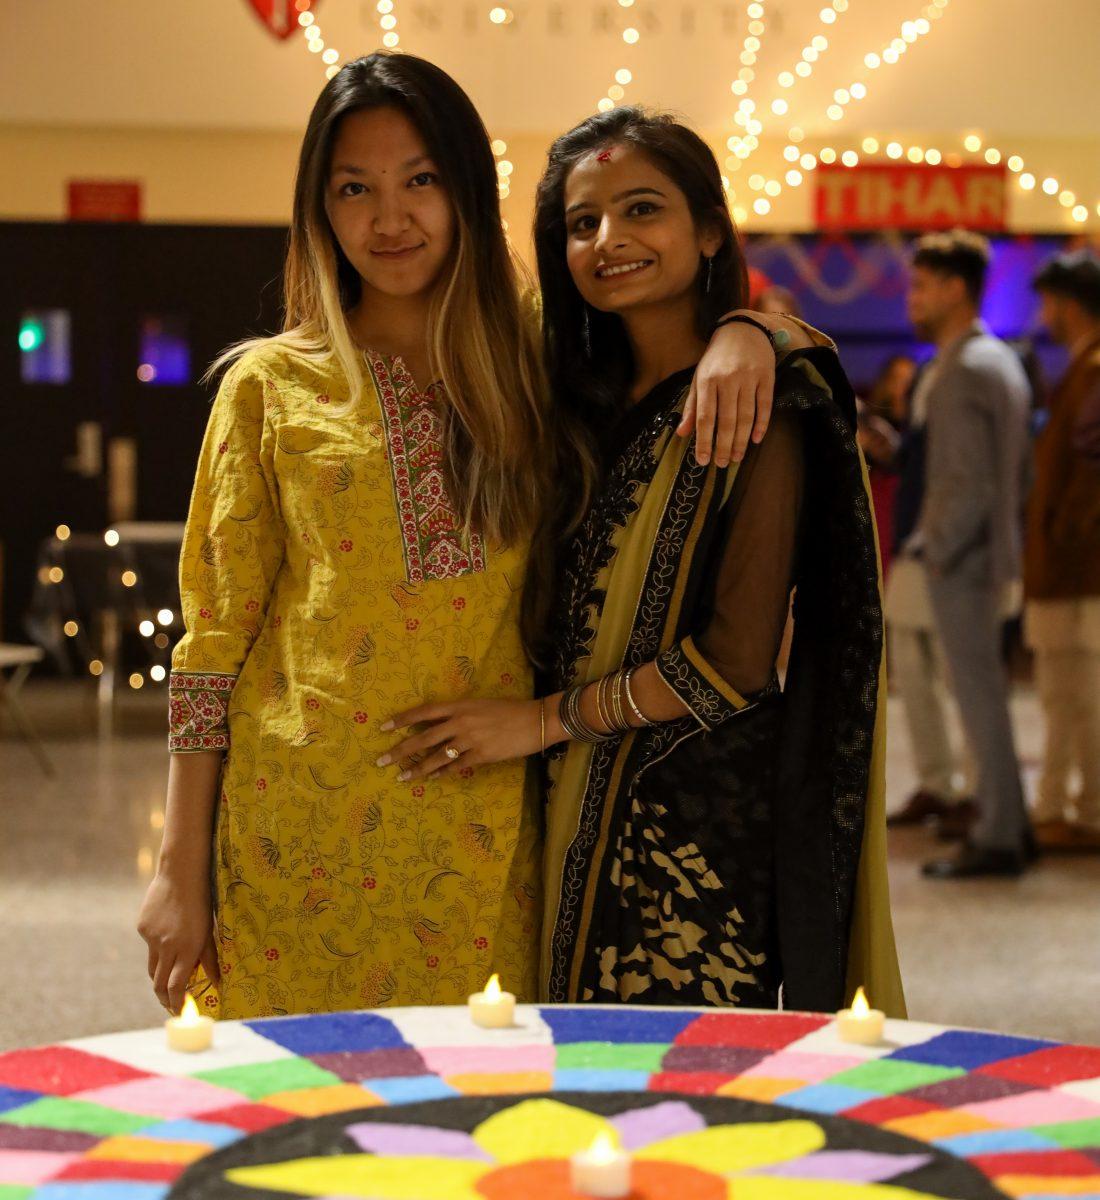 Students at CU Tihar event